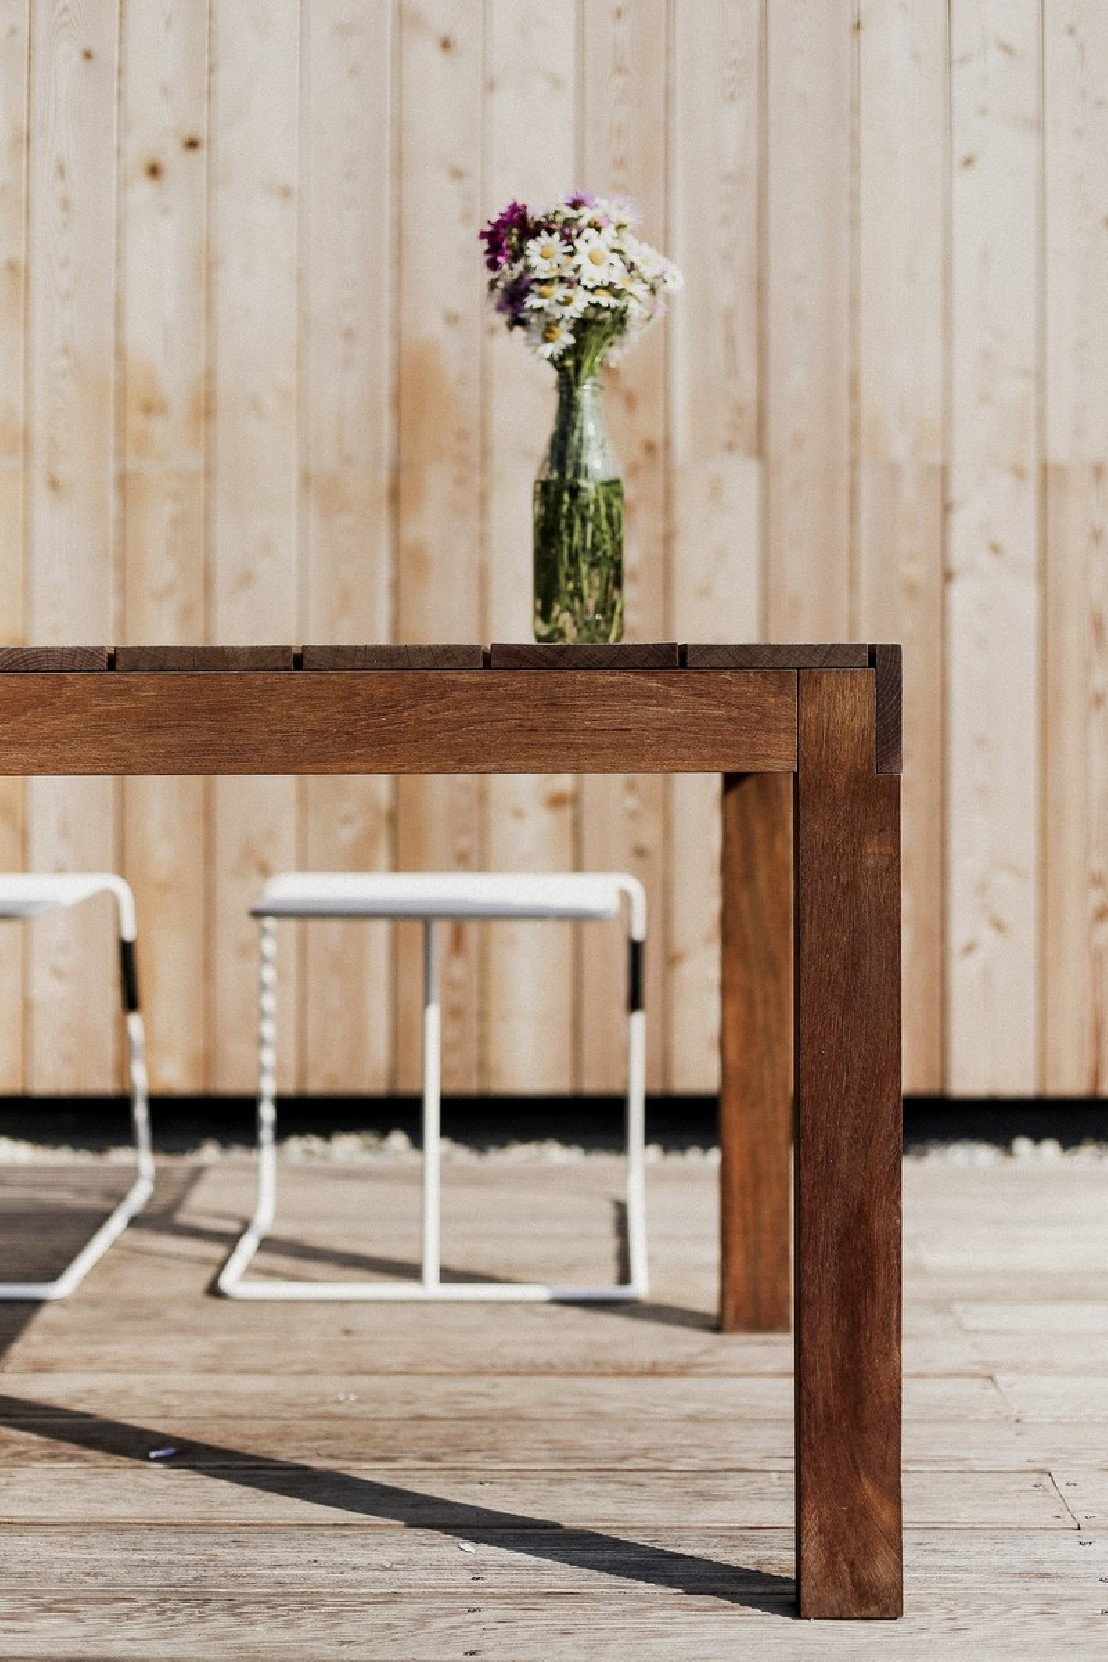 grande table de jardin rectangulaire sena 220 cm en bois massif d ip seanroyale. Black Bedroom Furniture Sets. Home Design Ideas